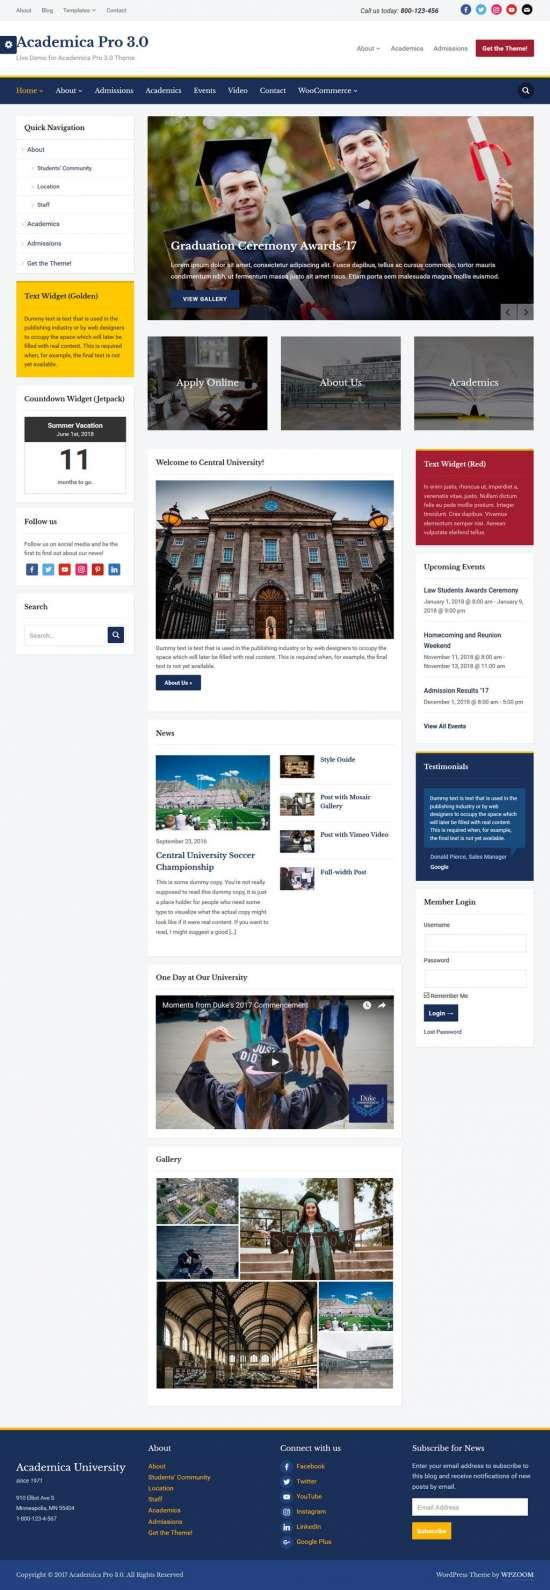 academica pro 3 education WordPress theme 01 550x1590 - Academica Pro 3.0 WordPress Theme